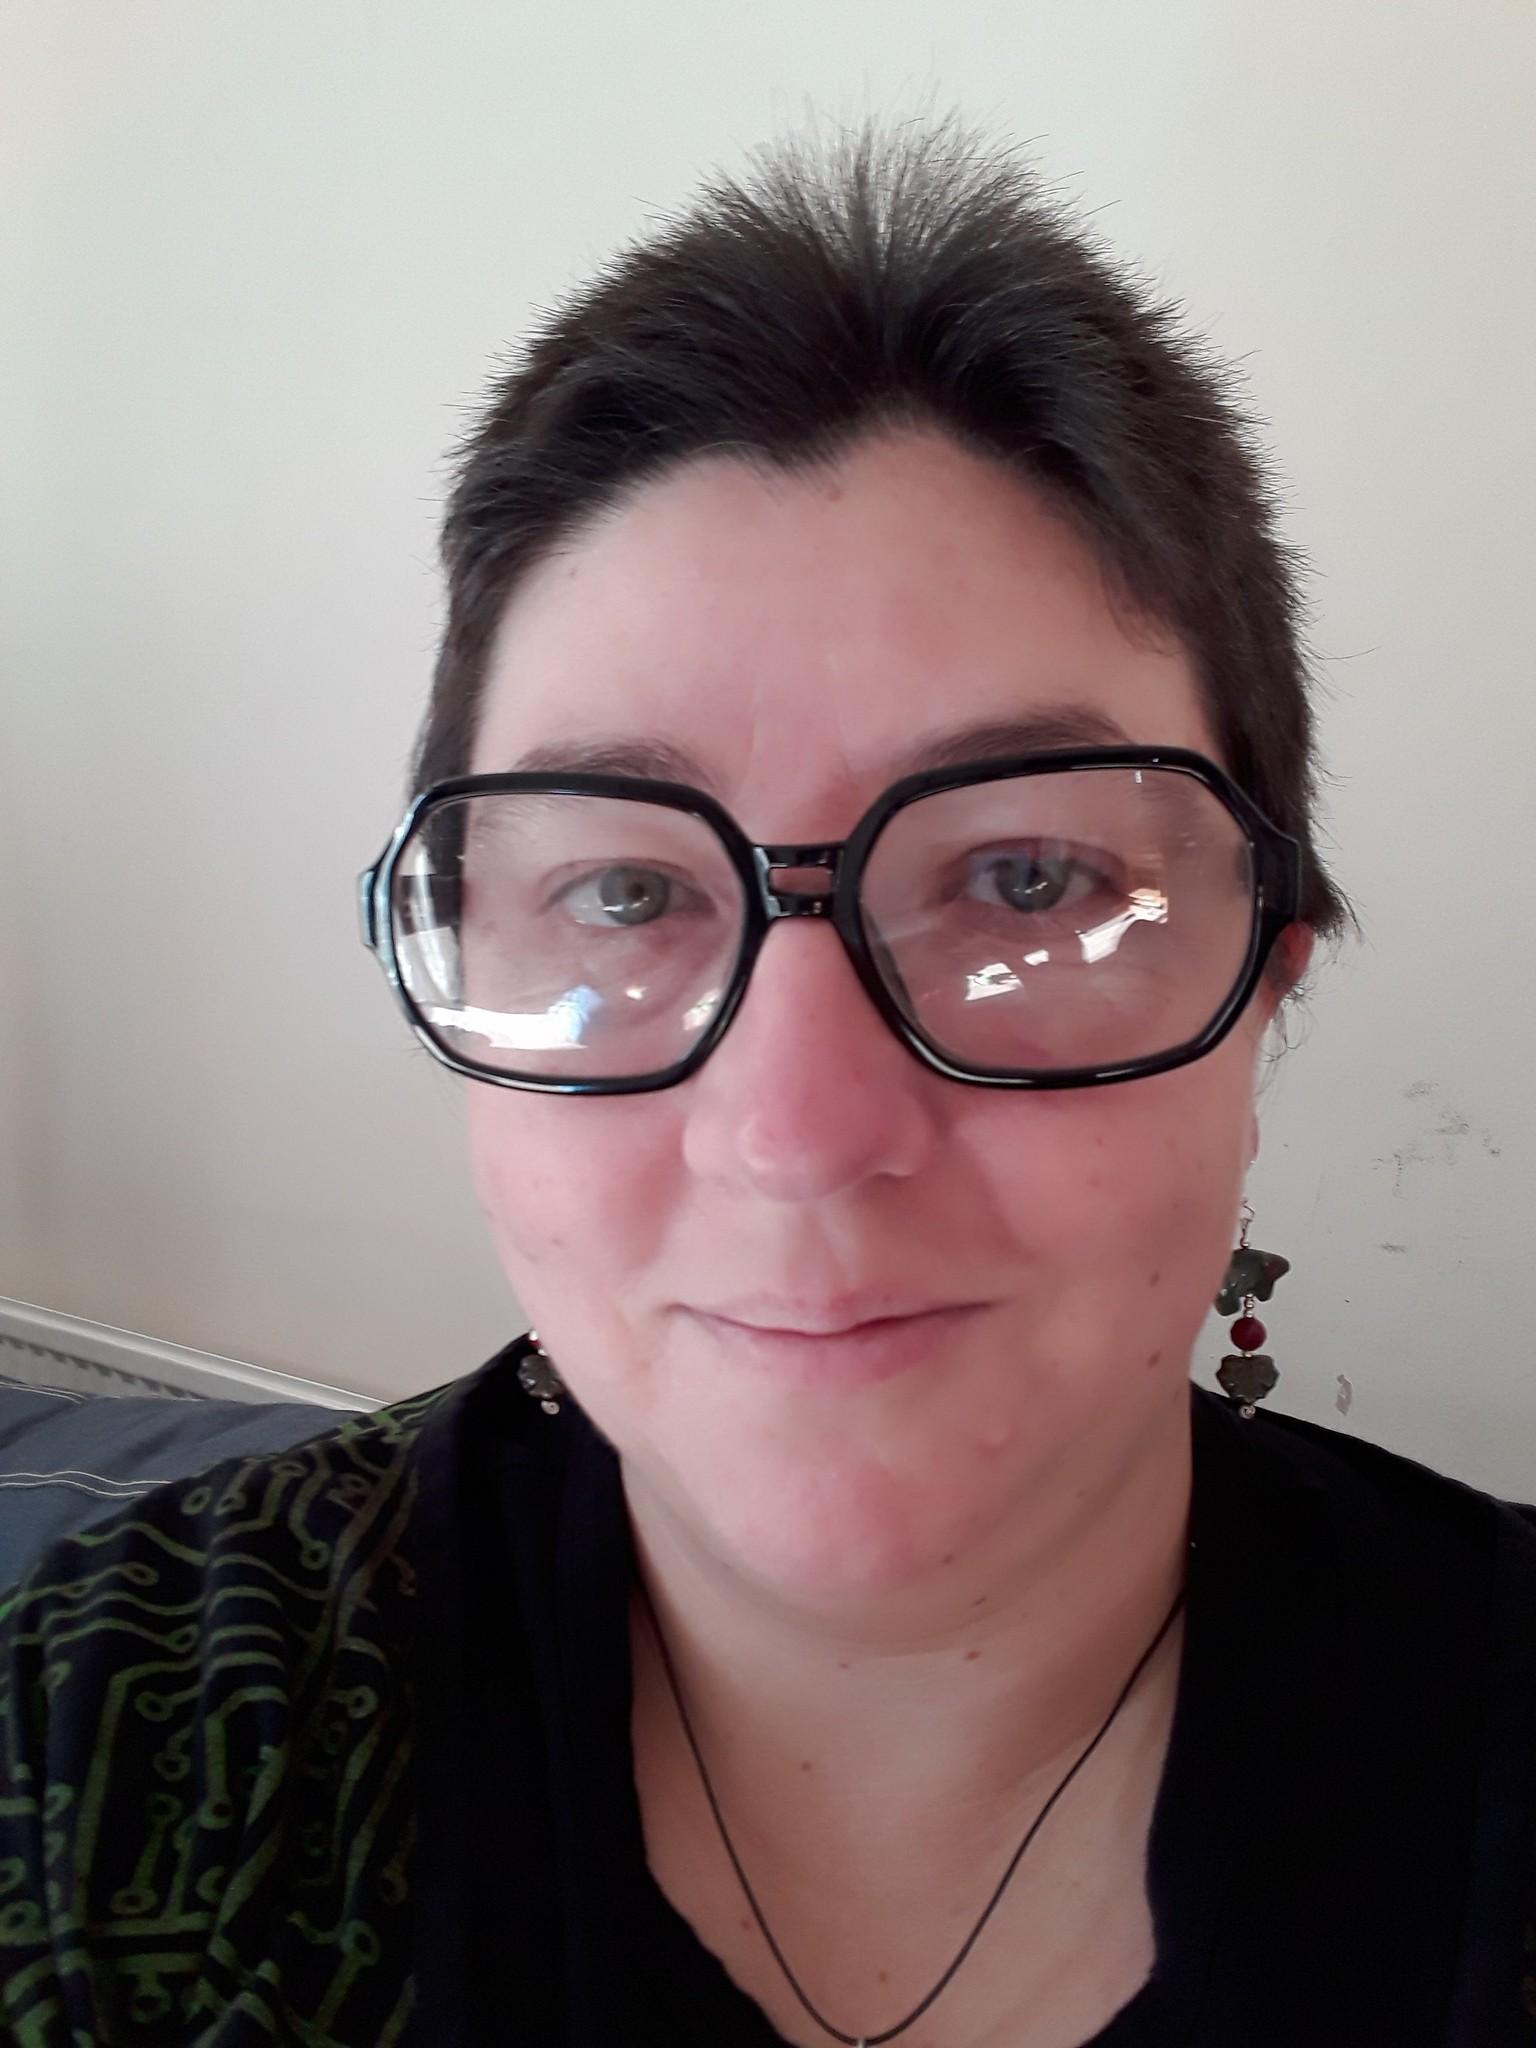 Communication on this topic: Jennifer Welles, christine-auten/